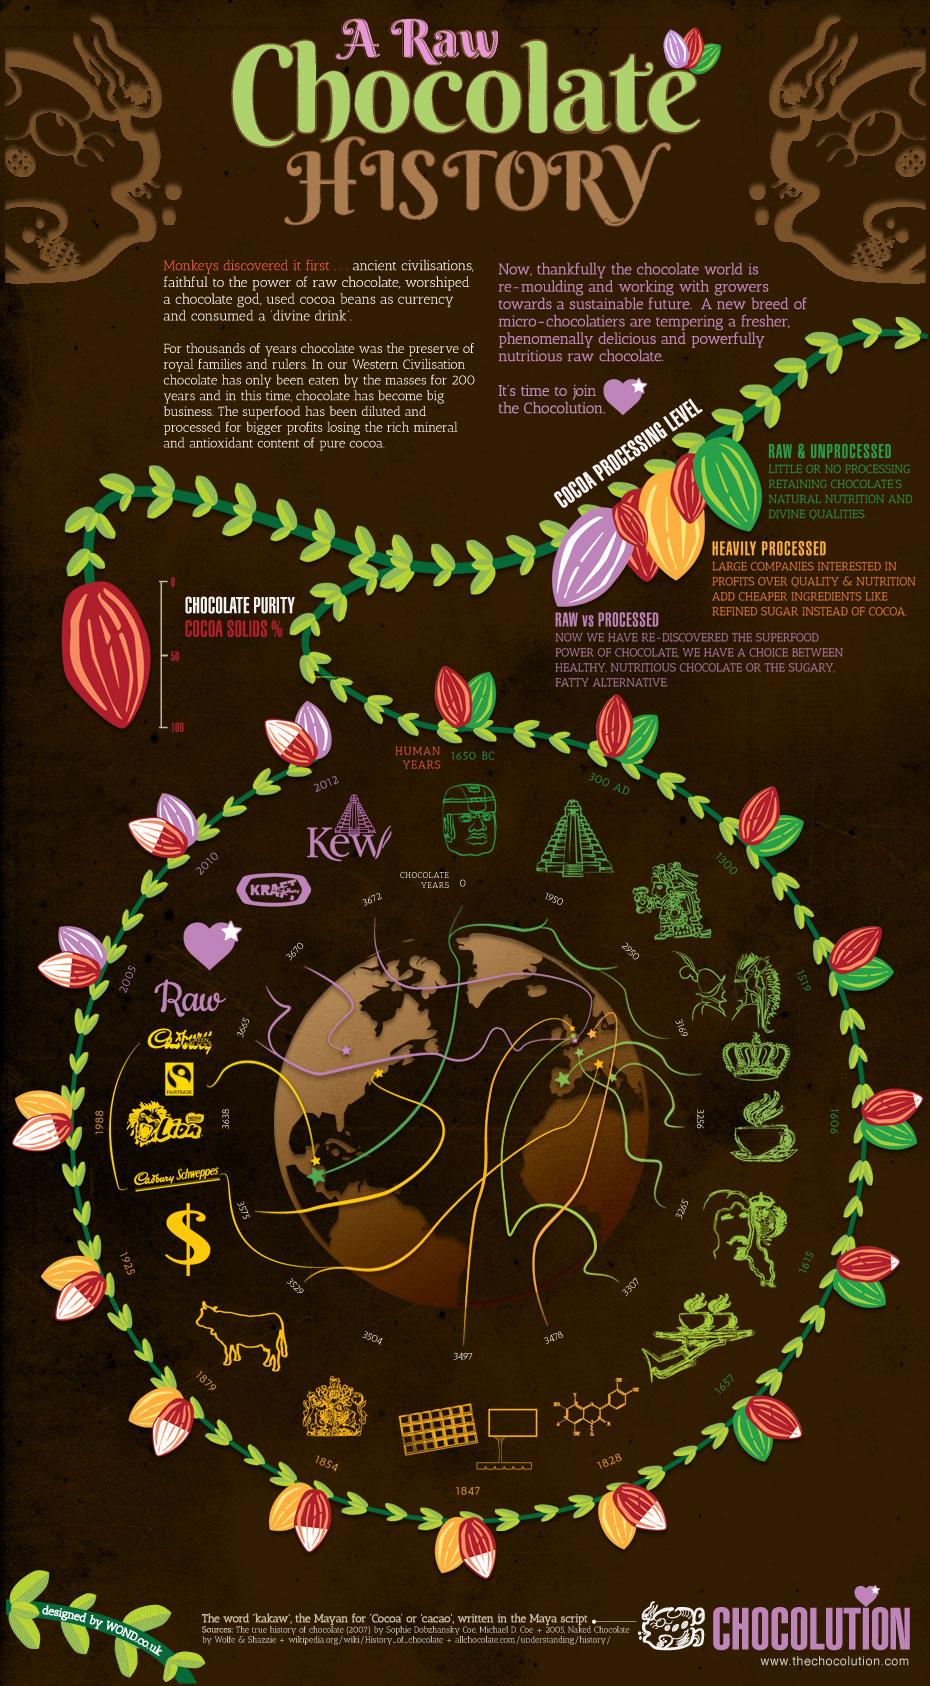 A Raw Chocolate History